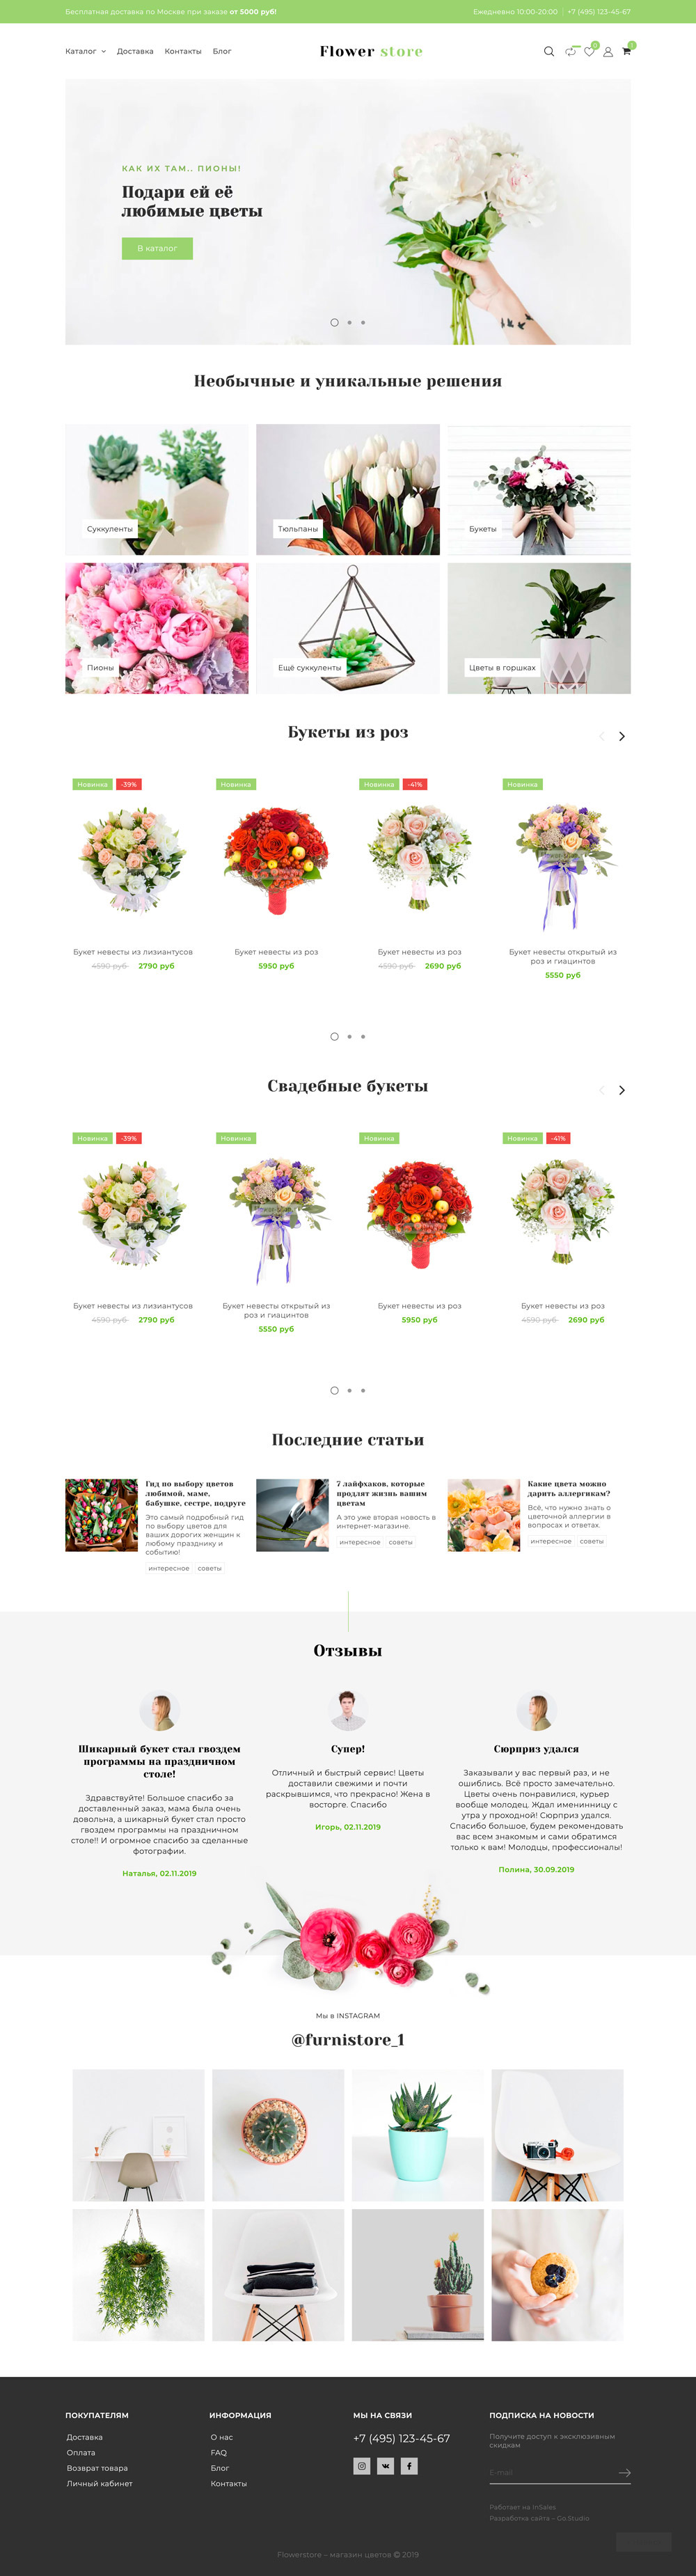 Flowerstore – шаблон для Insales